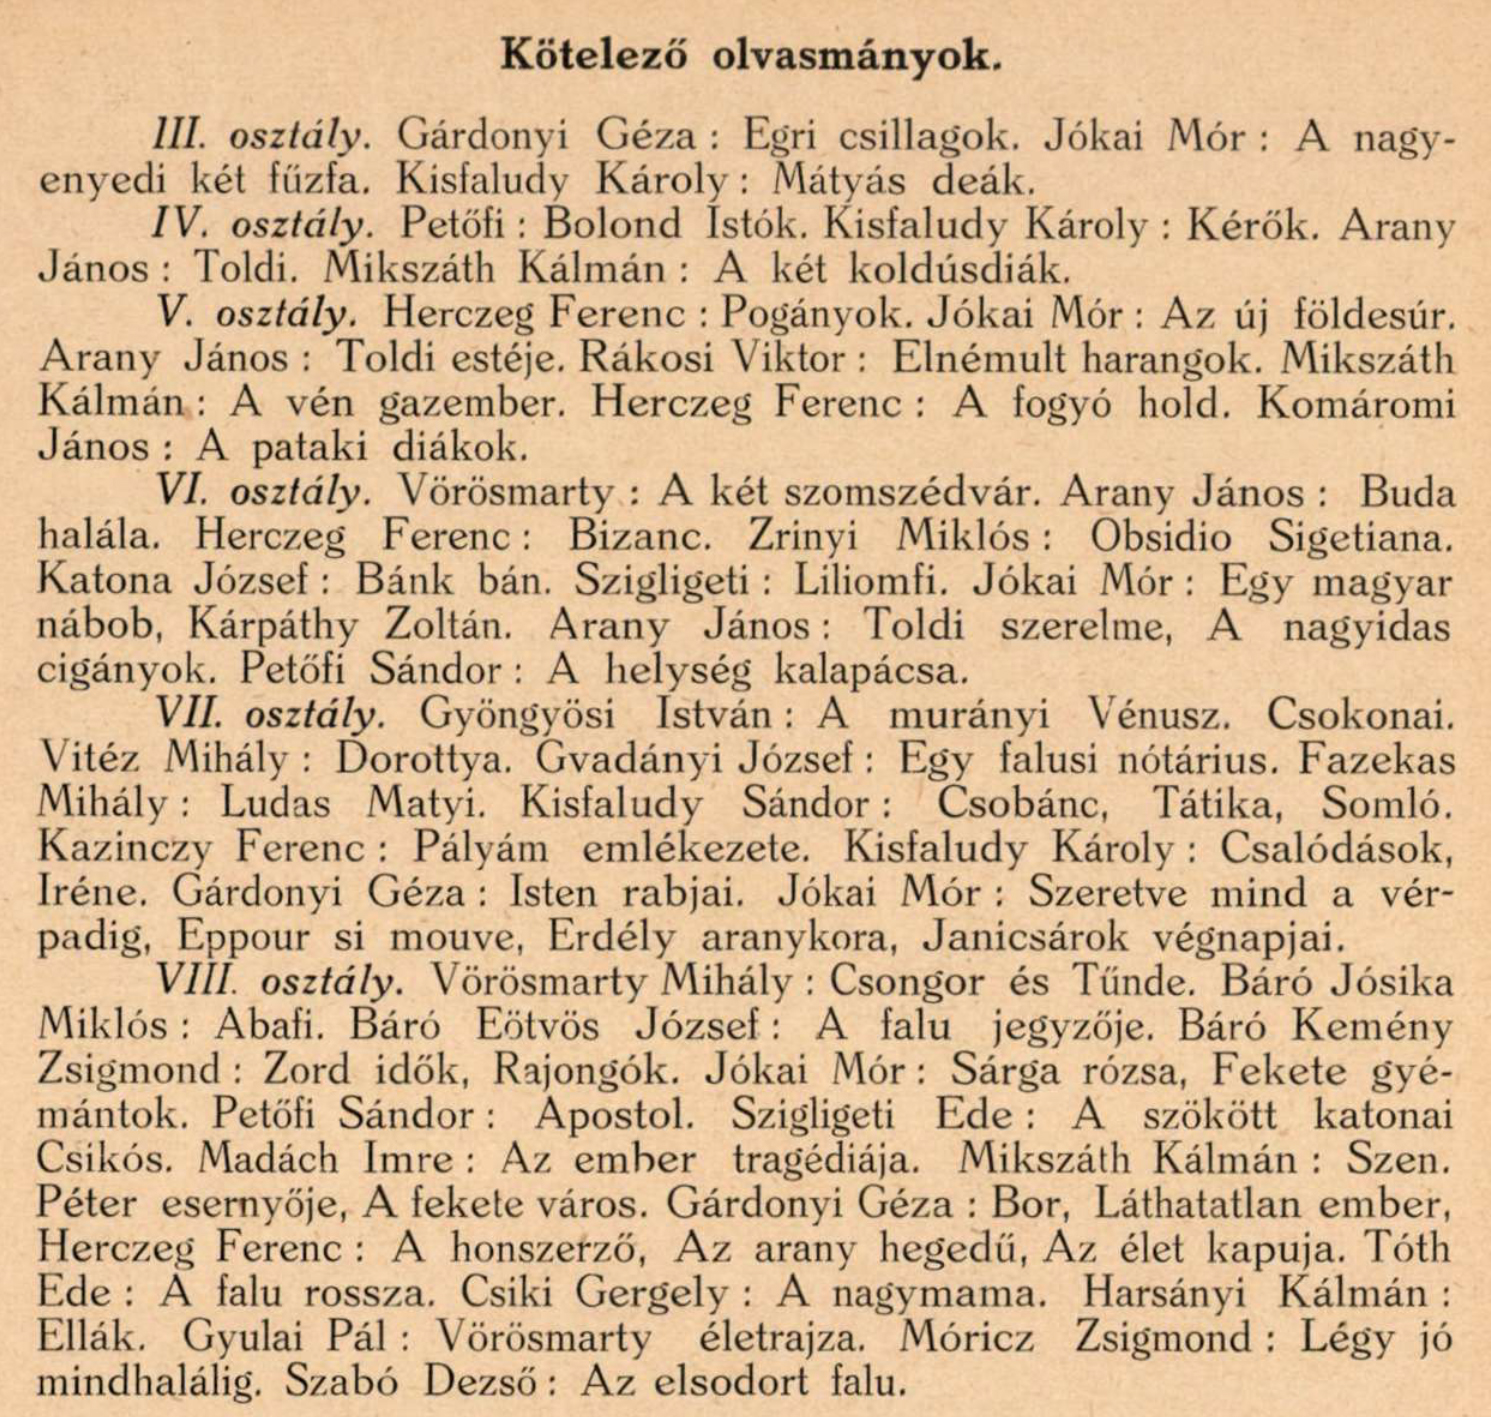 1938-kotelezok.jpg